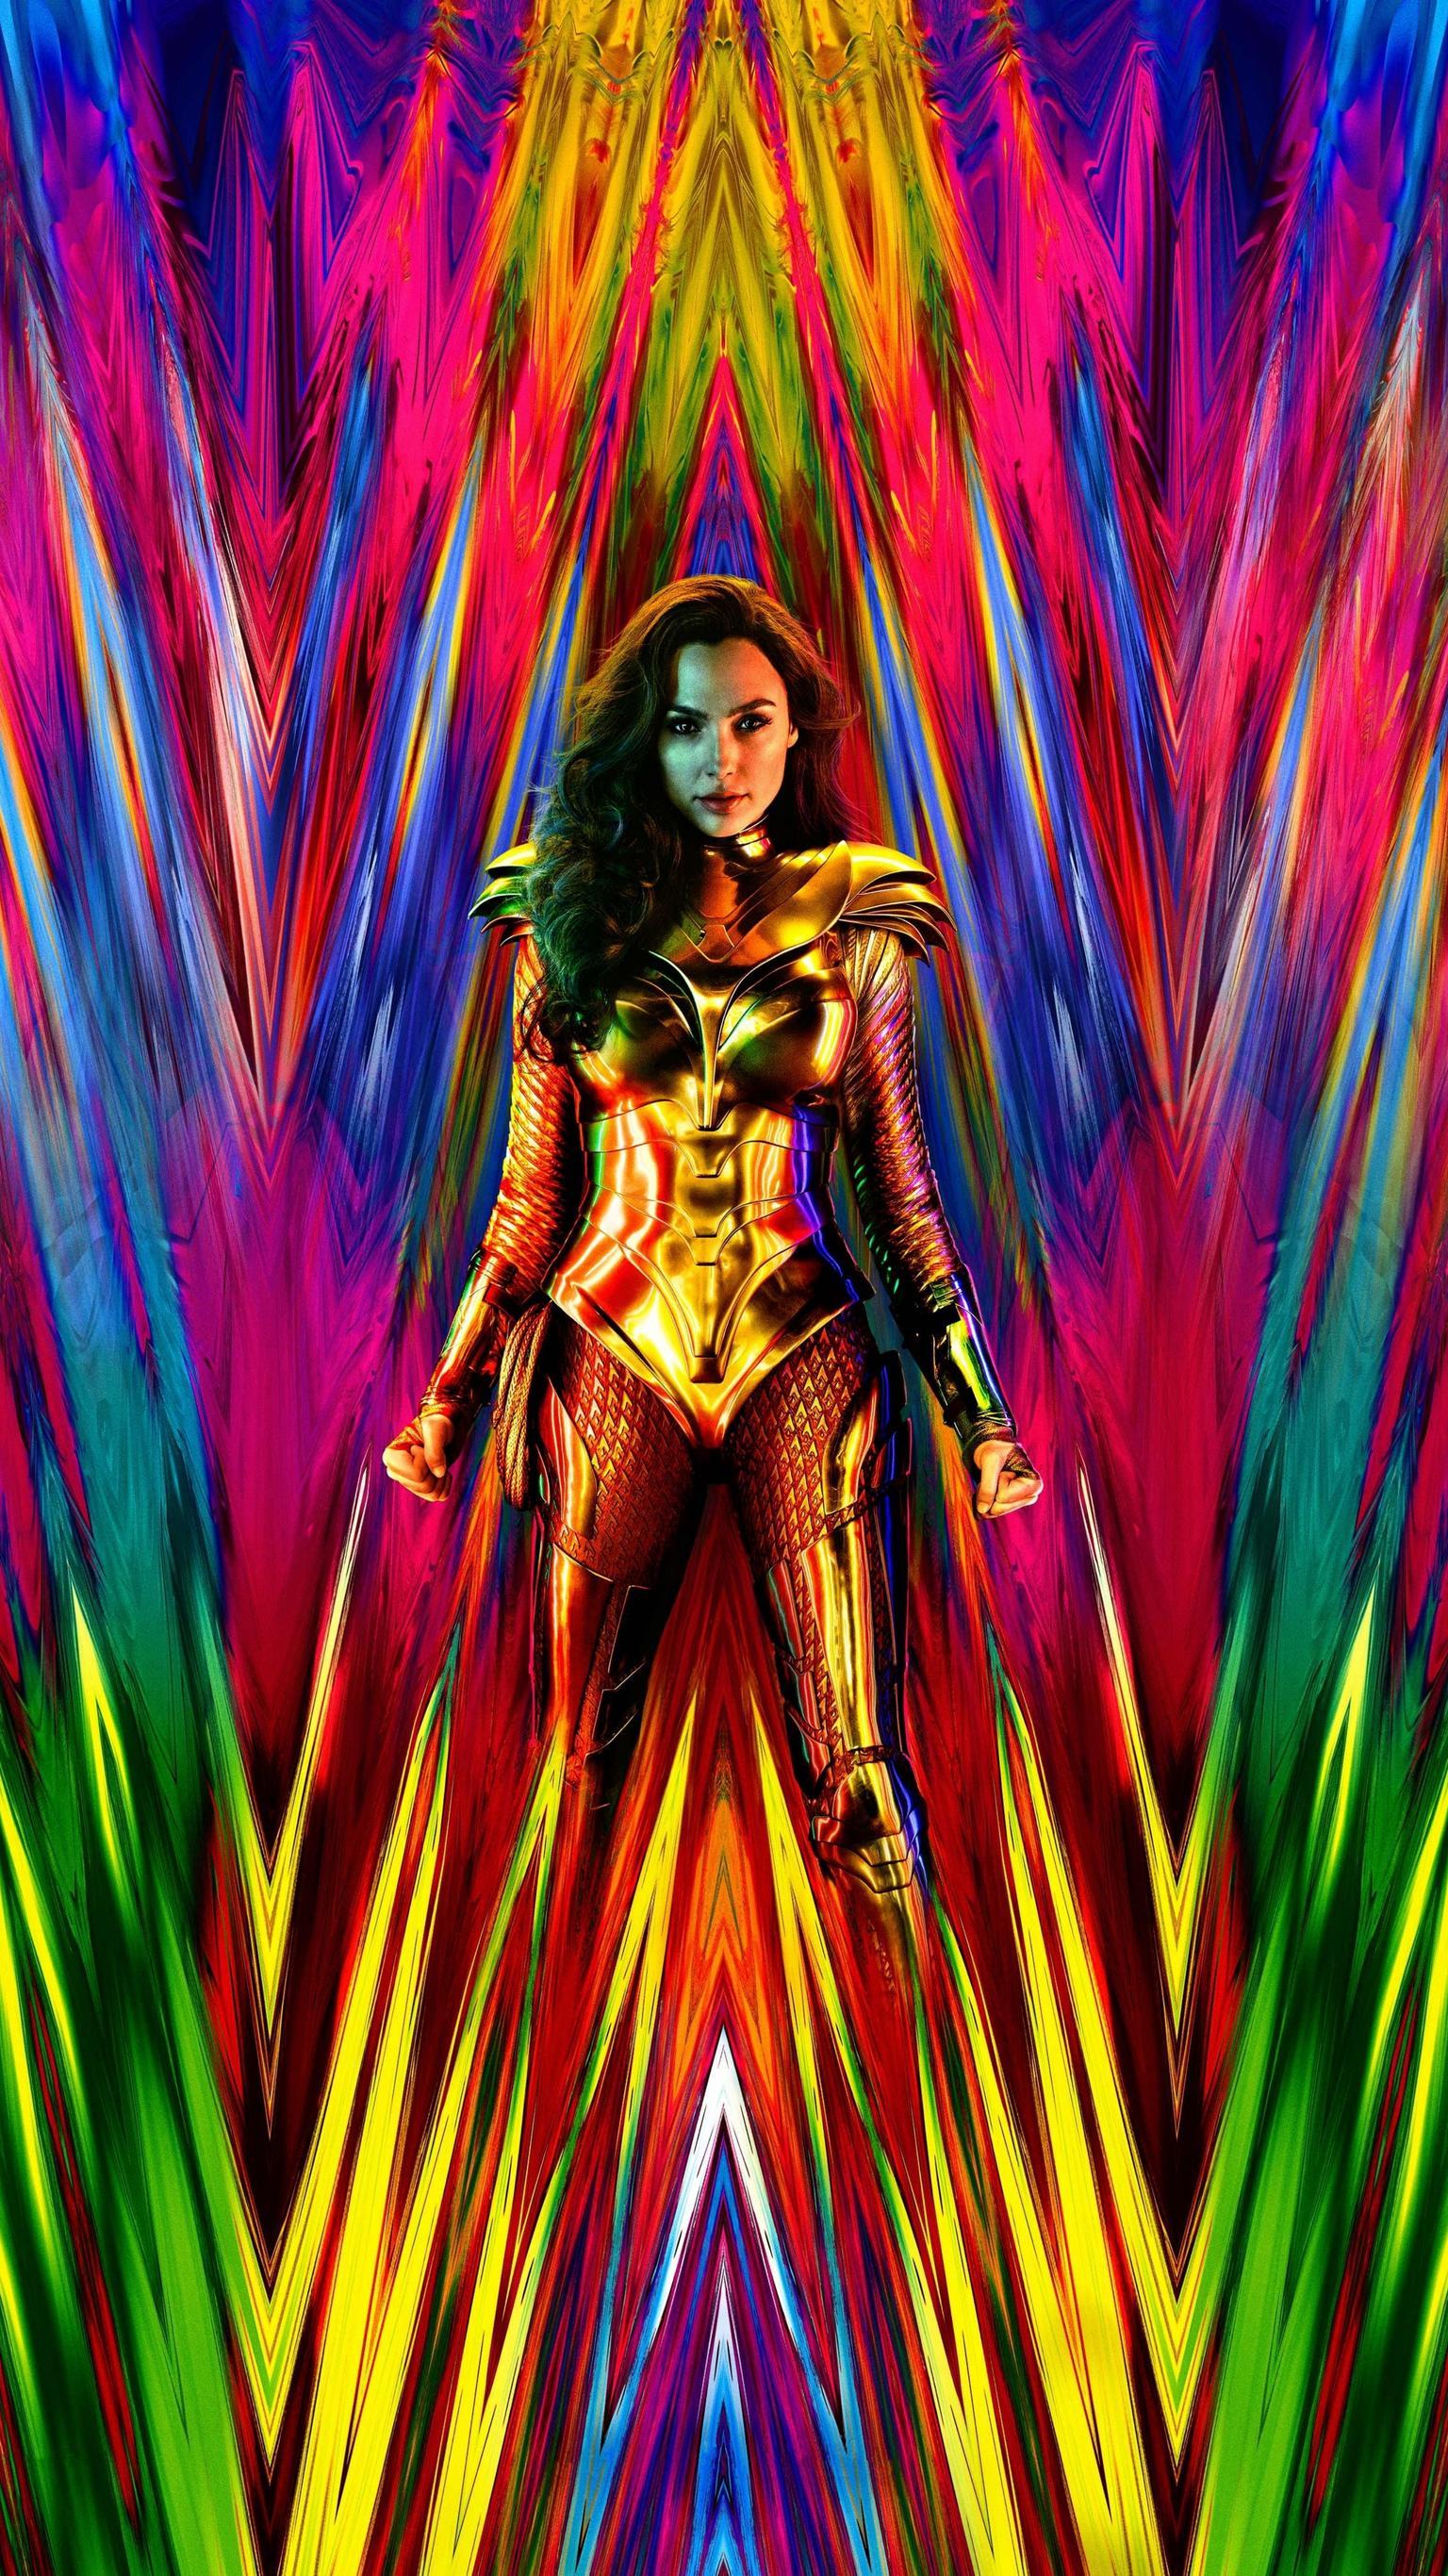 Wonder Woman 1984 2020 Phone Wallpaper Moviemania 1536x2732